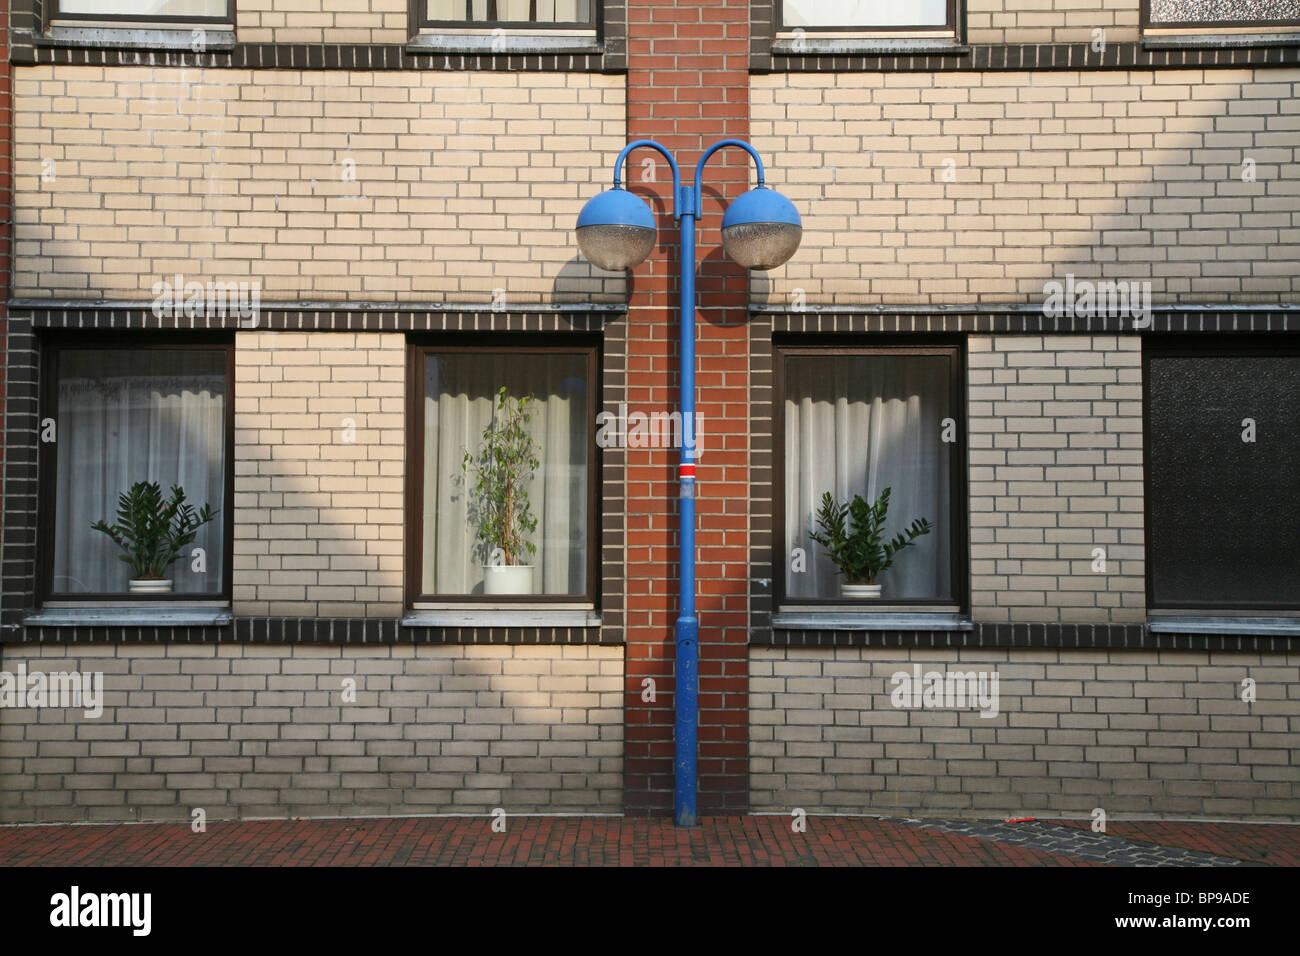 blue street lights, brick facade, northern Germany - Stock Image